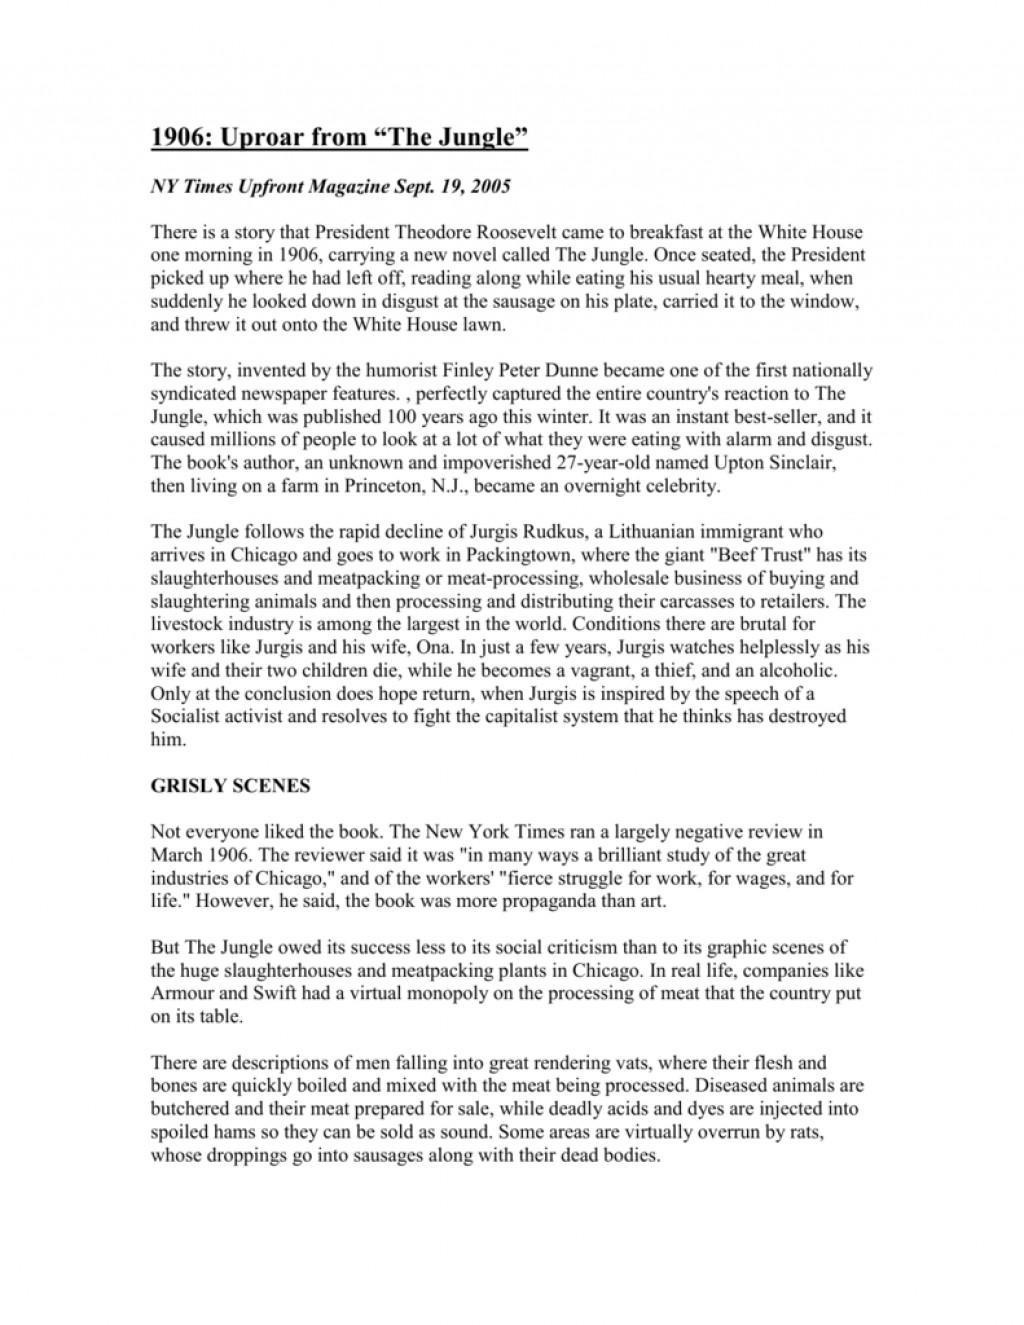 005 The Jungle Upton Sinclair Book Review Essay 007627924 2 Rare Large